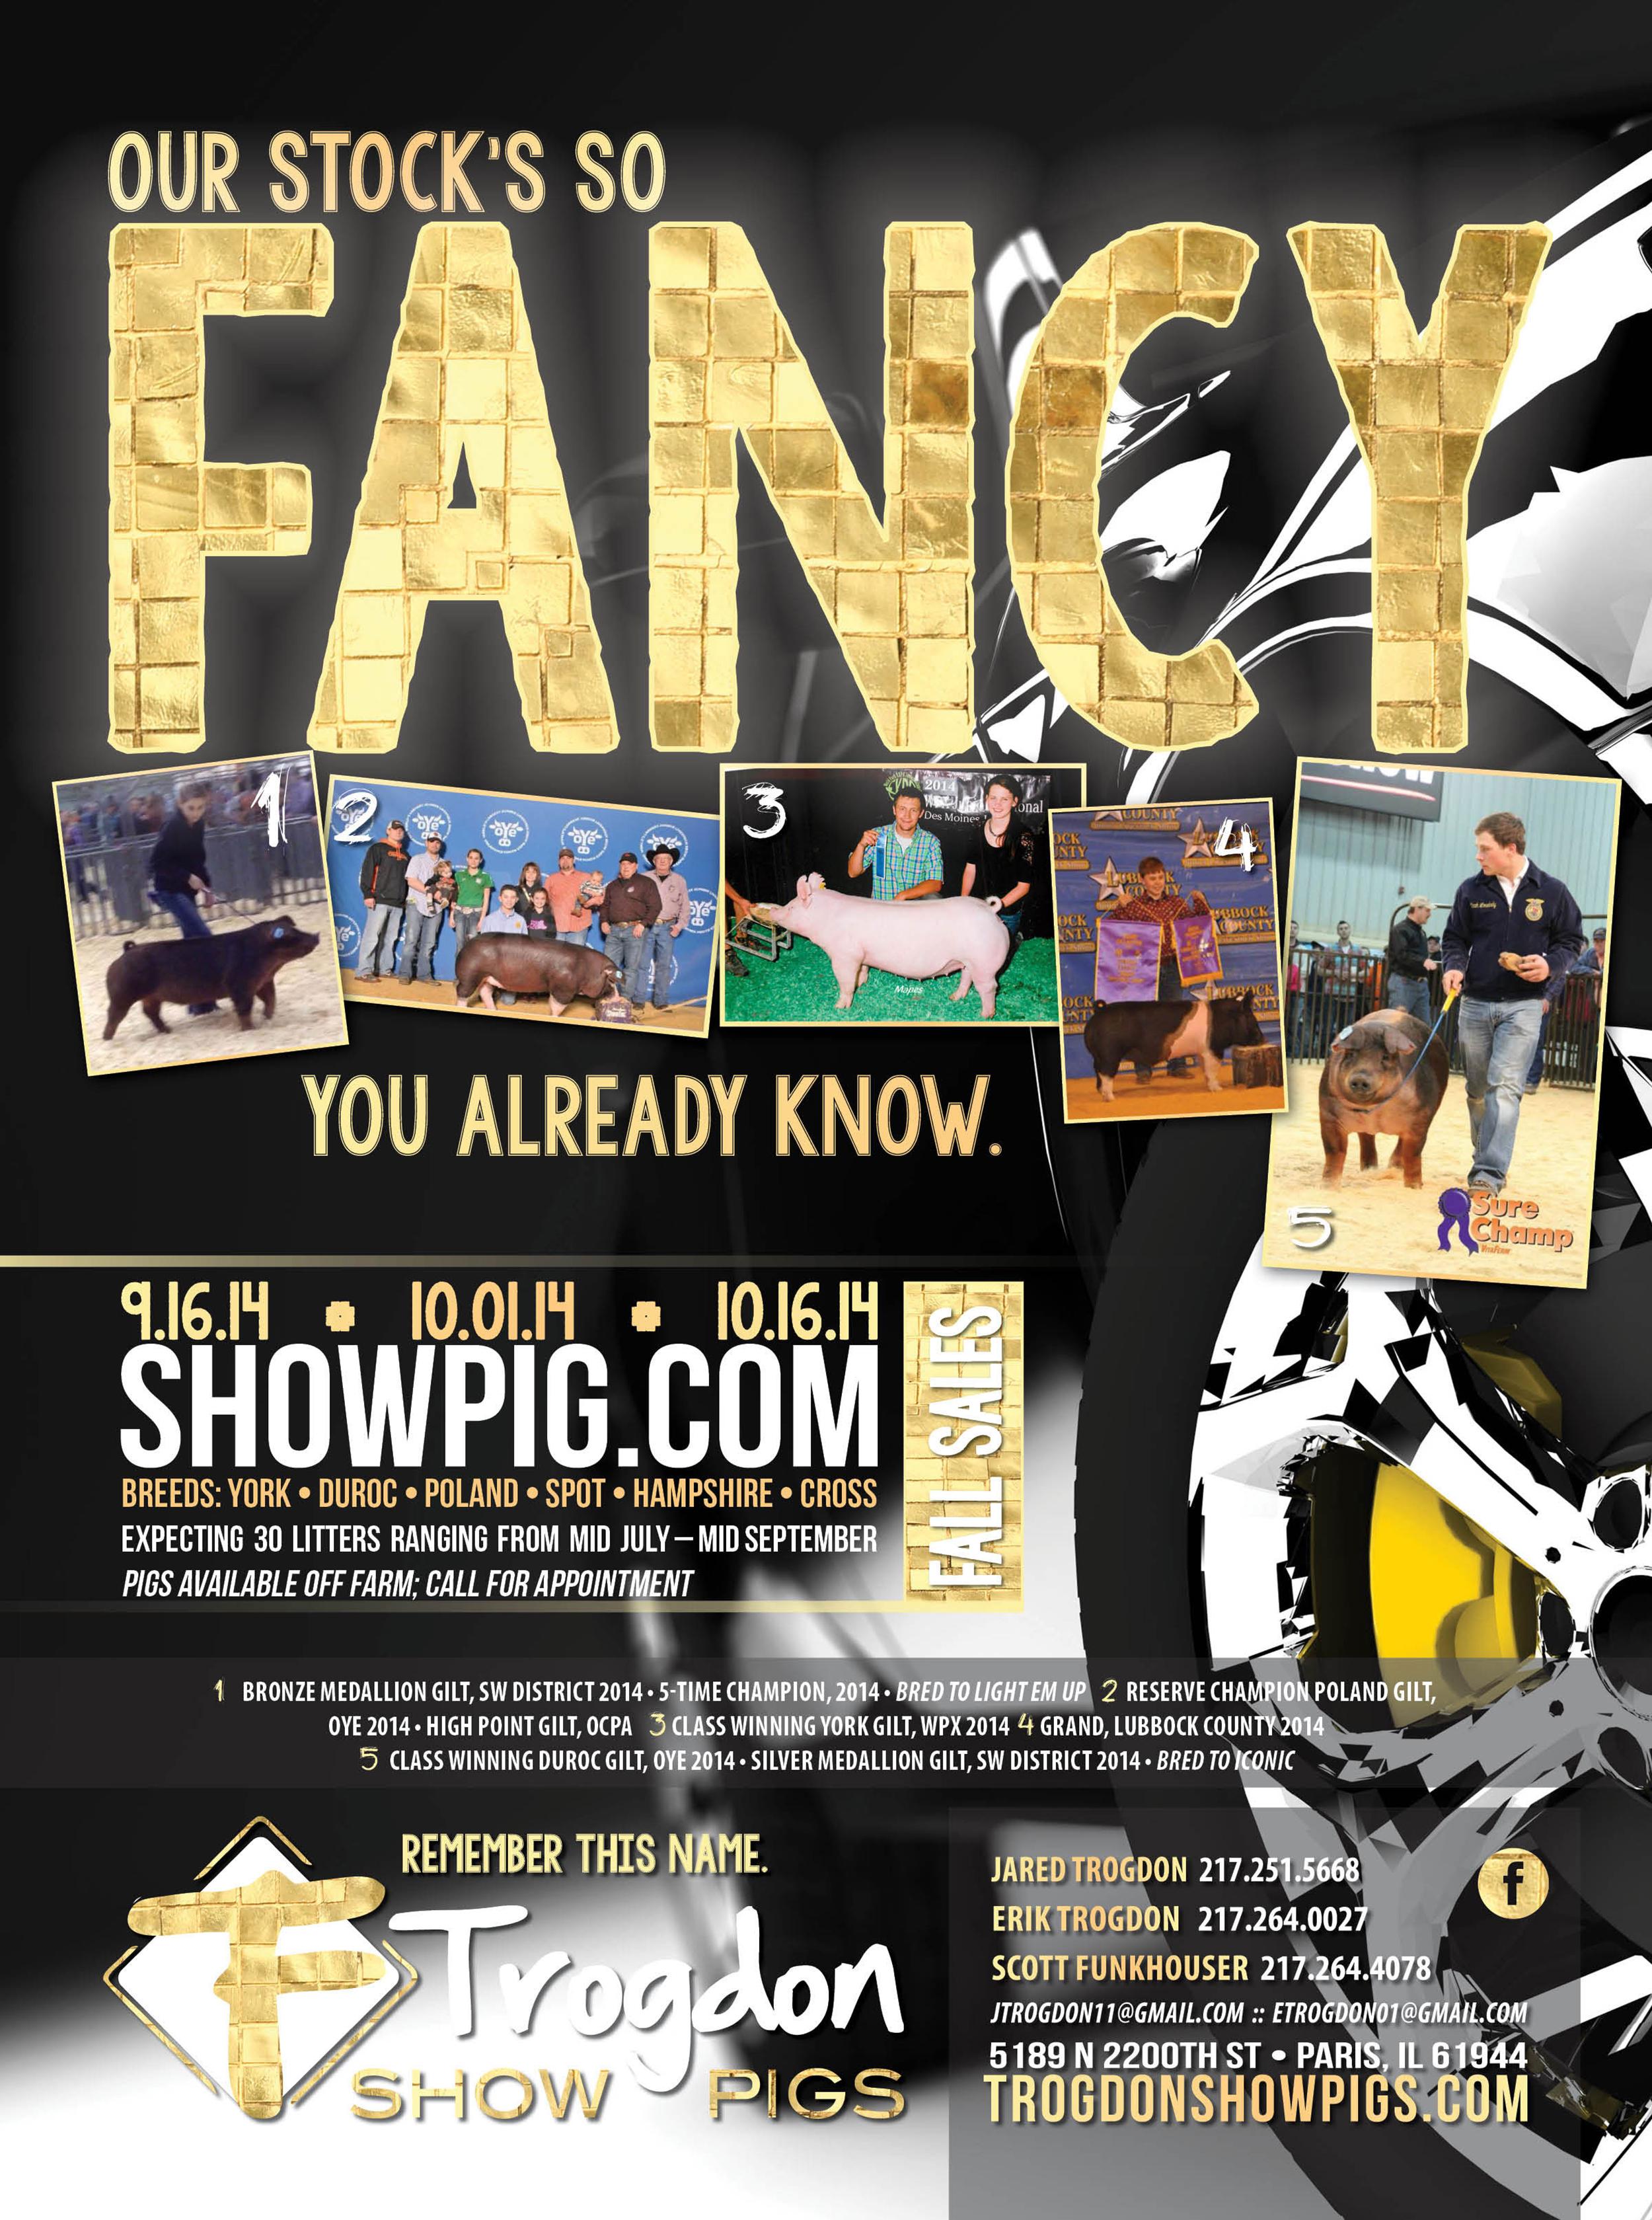 Trogdon-Show-Pigs_f14_fancy-advertisement.jpg